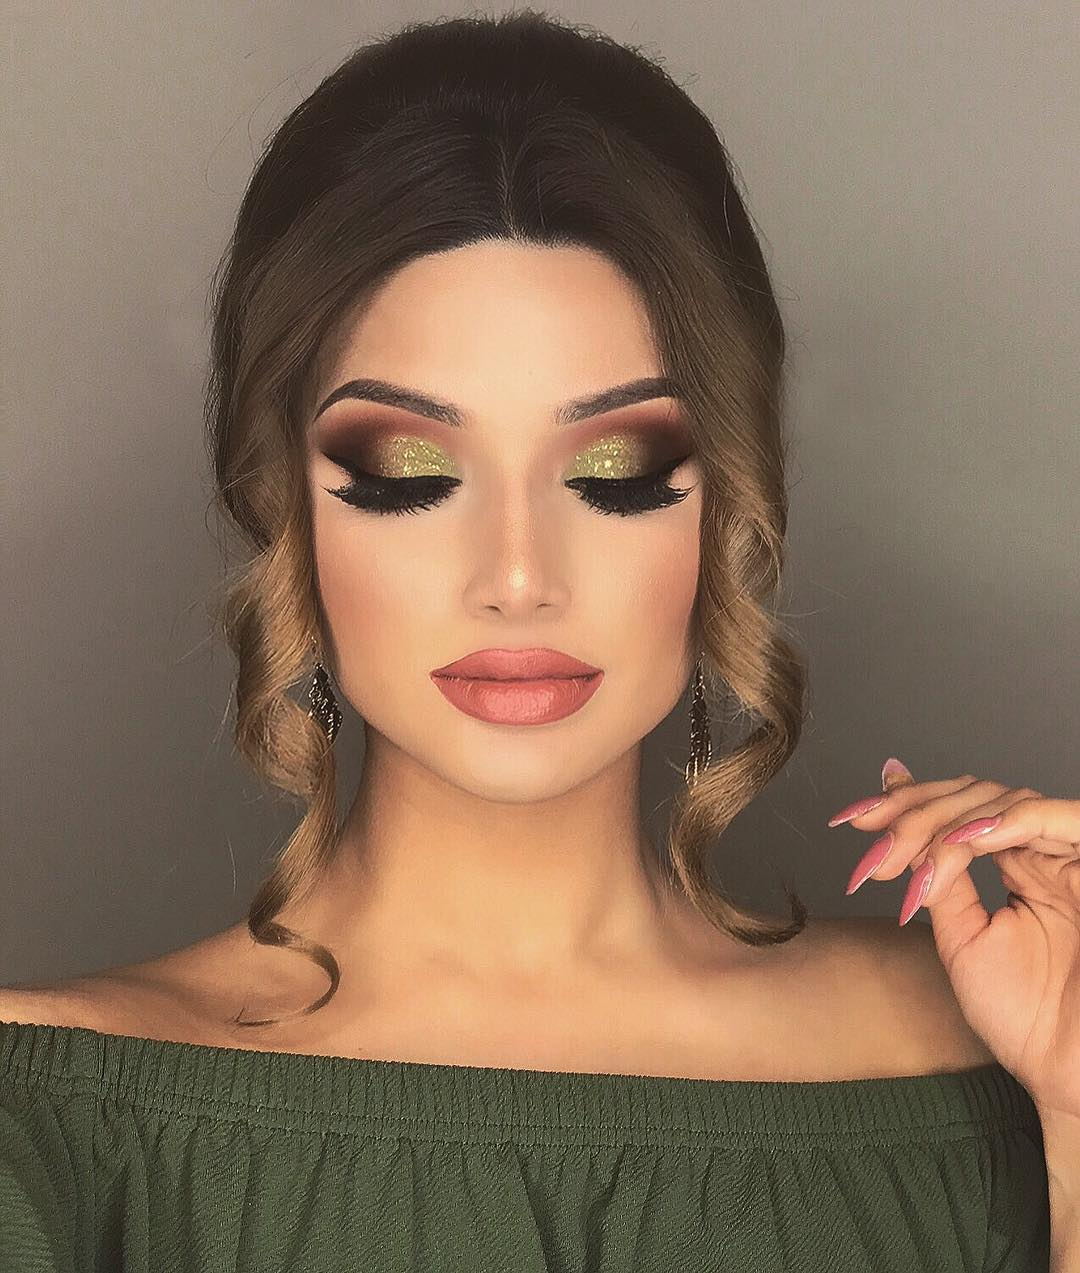 красивые идеи макияжа 2019 фото 19